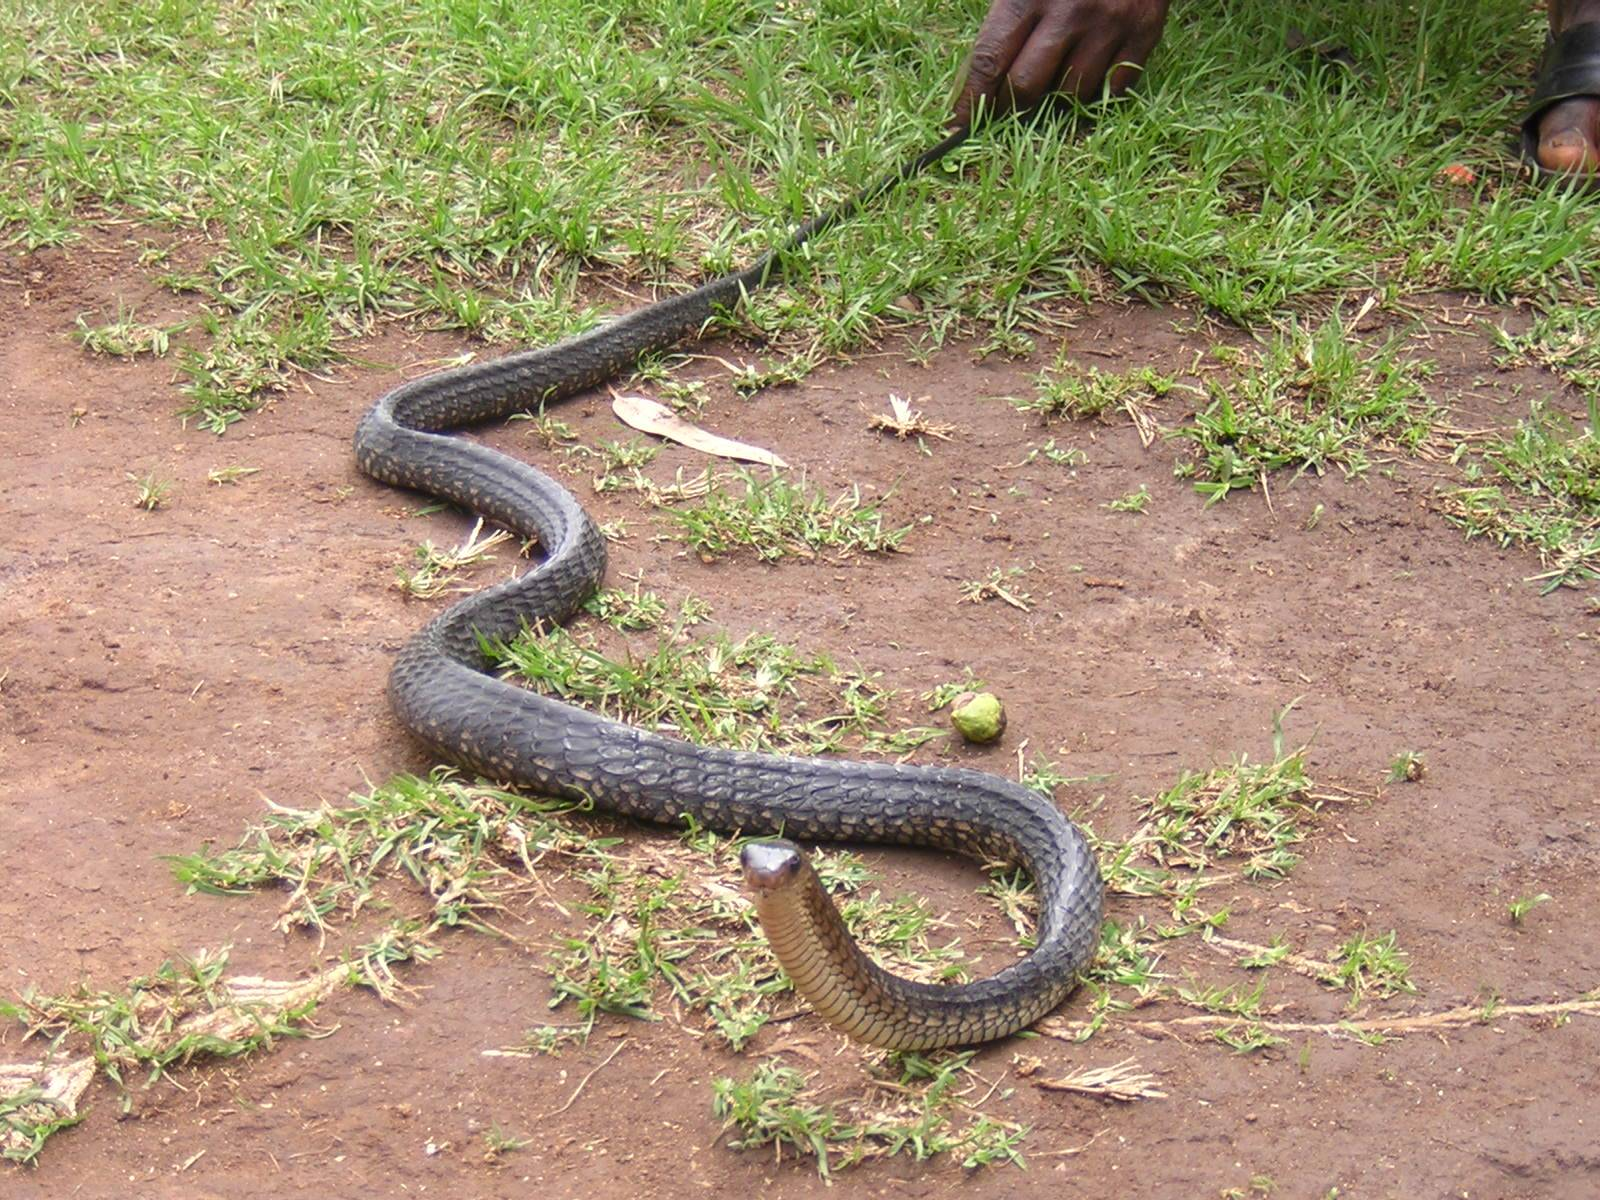 water cobra